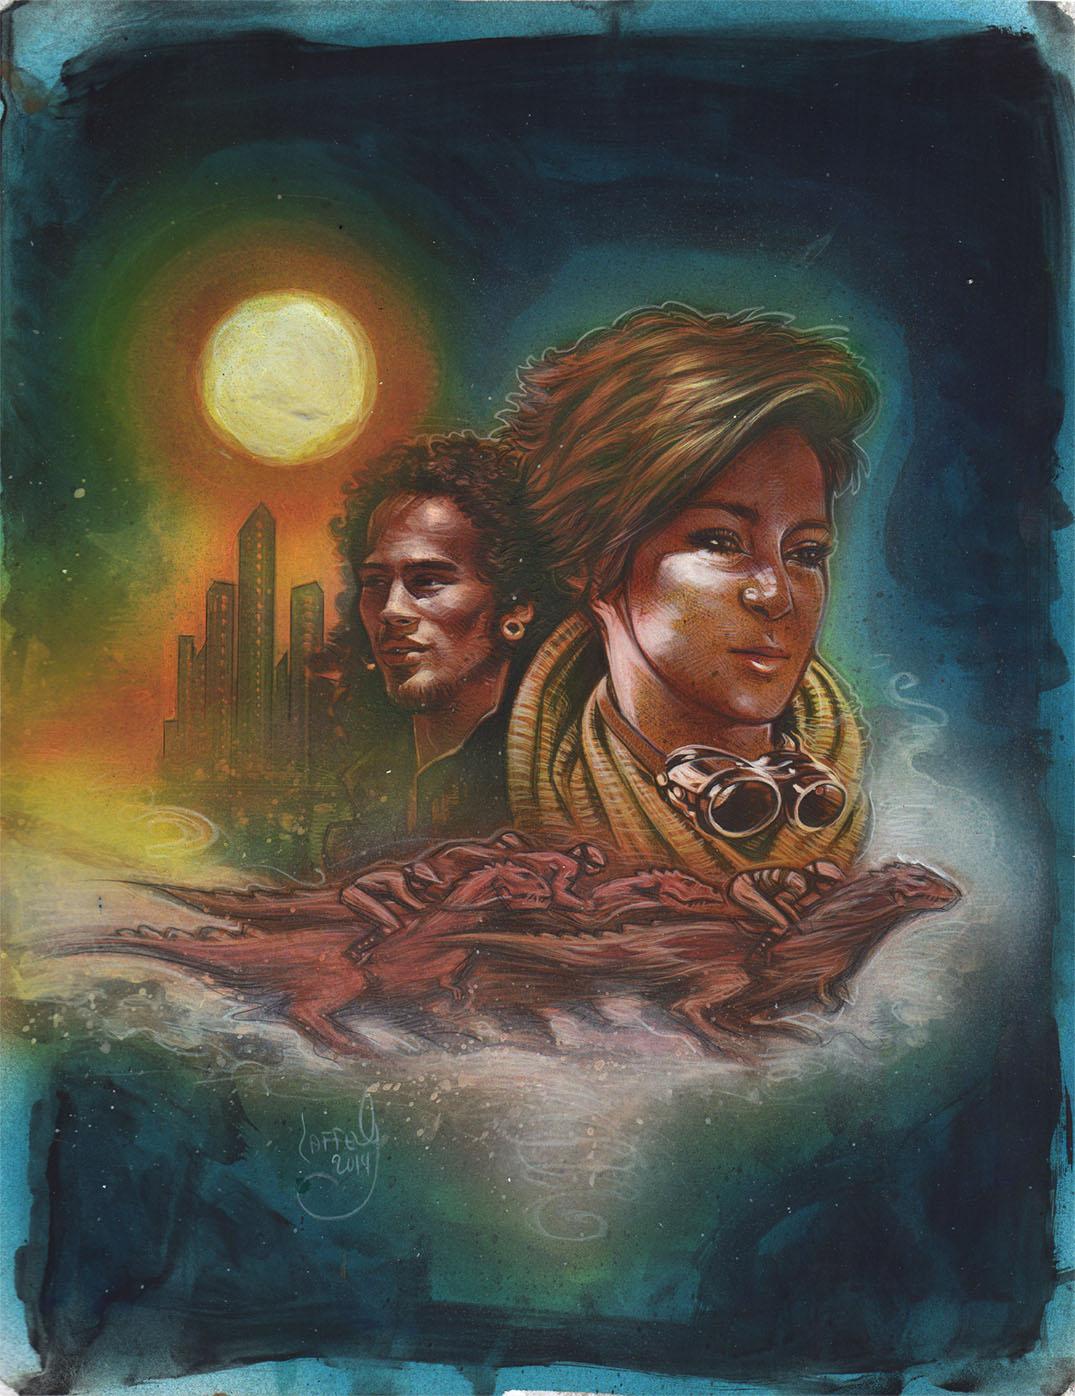 Book Cover Art Copyright : Jeff lafferty original art illustration